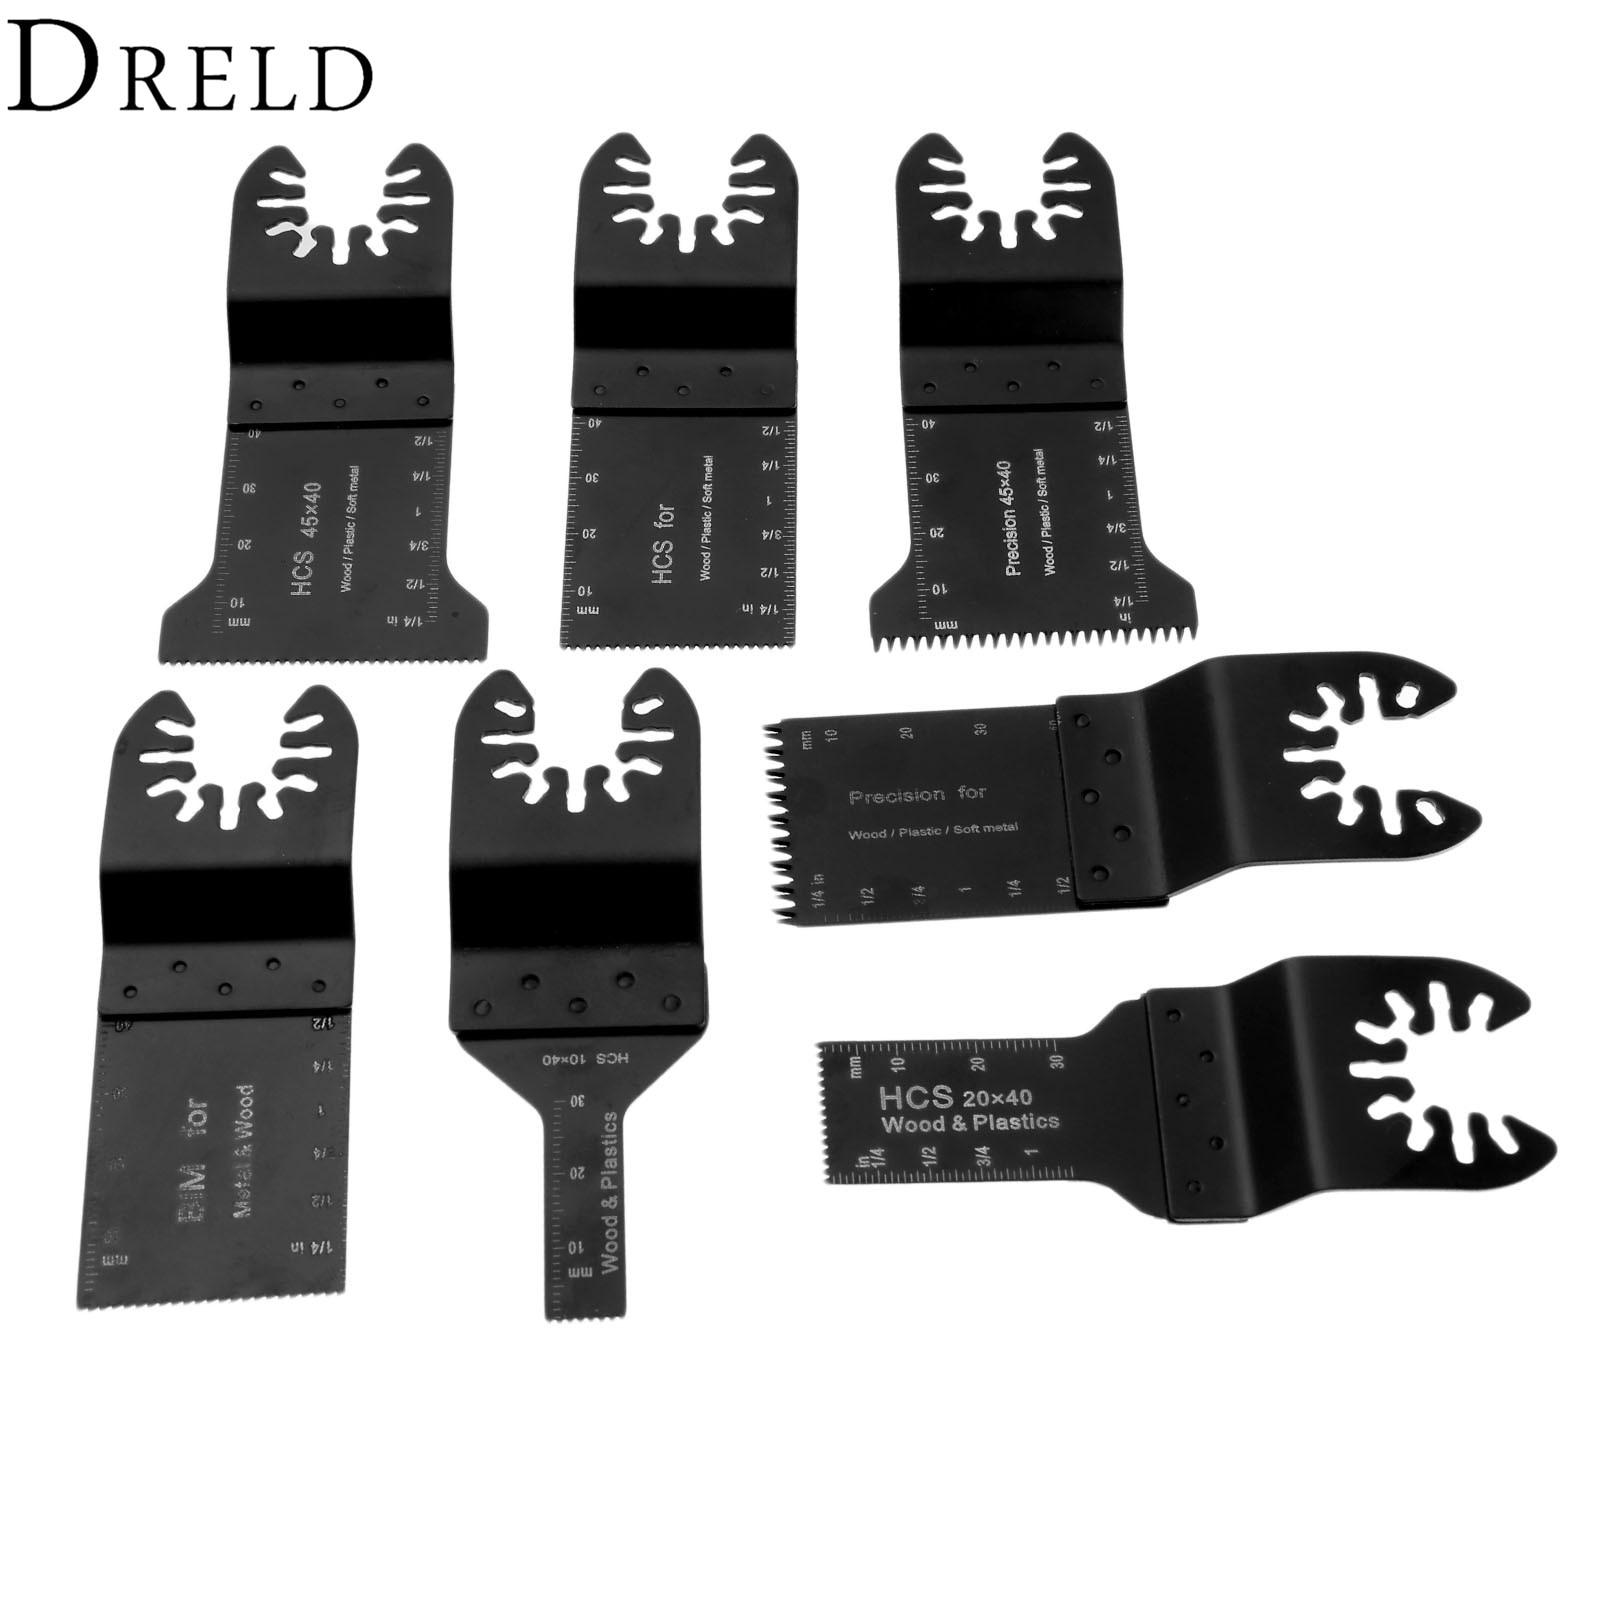 DRELD 7pcs/set Oscillating MultiTools Quick Release Saw Blade Multifunction Tools For Multimaster Renovator Bosch Power Tools